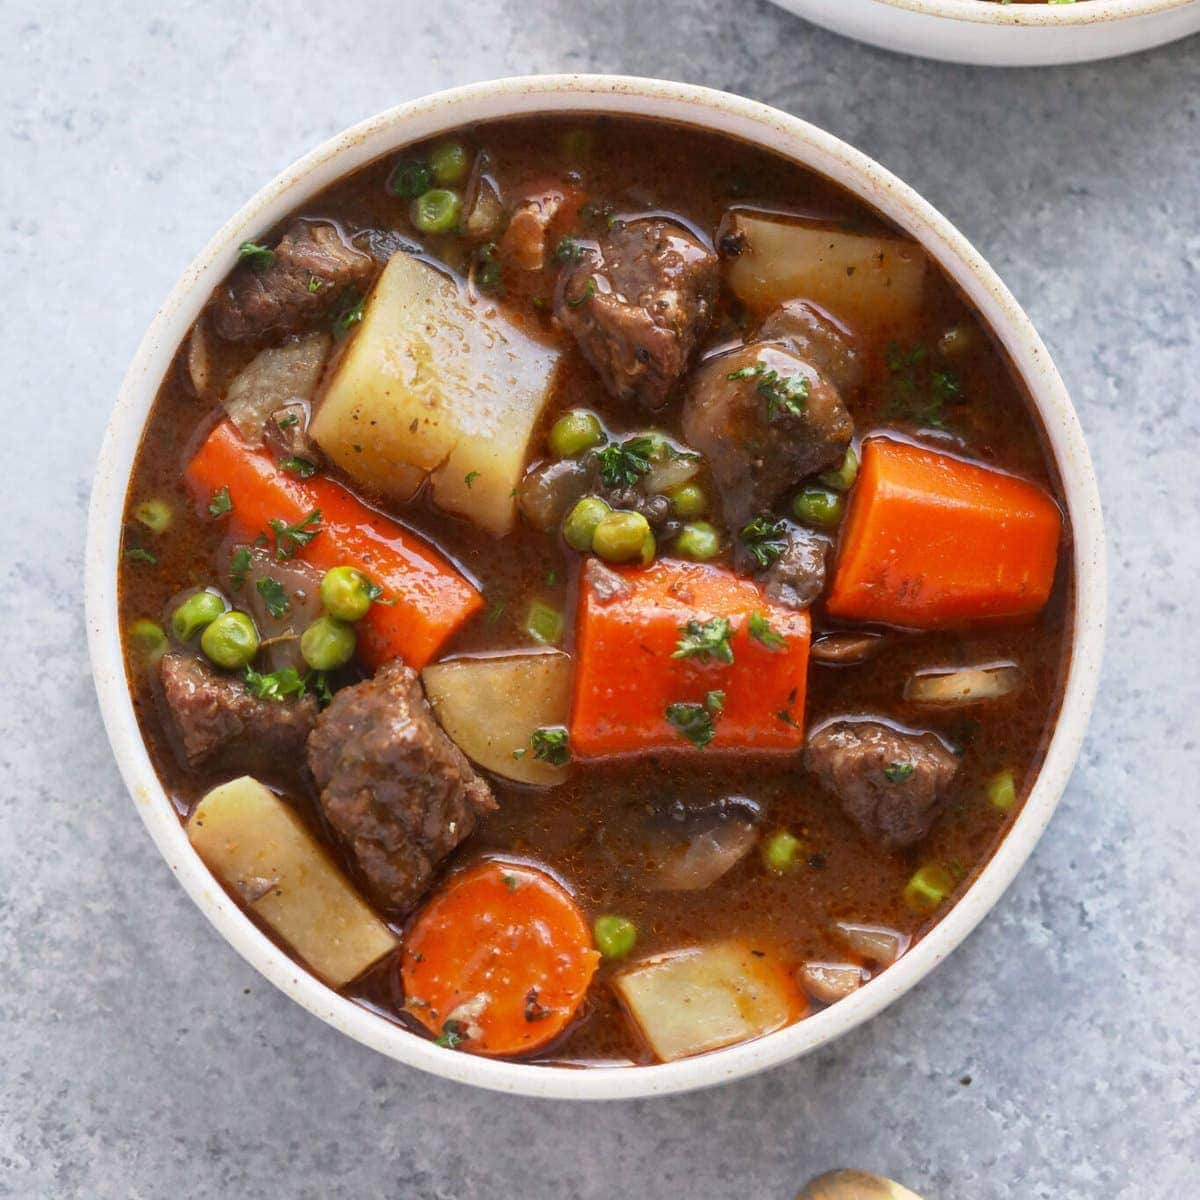 Slow Cooker Beef Stew Healthy Ingredients Fit Foodie Finds